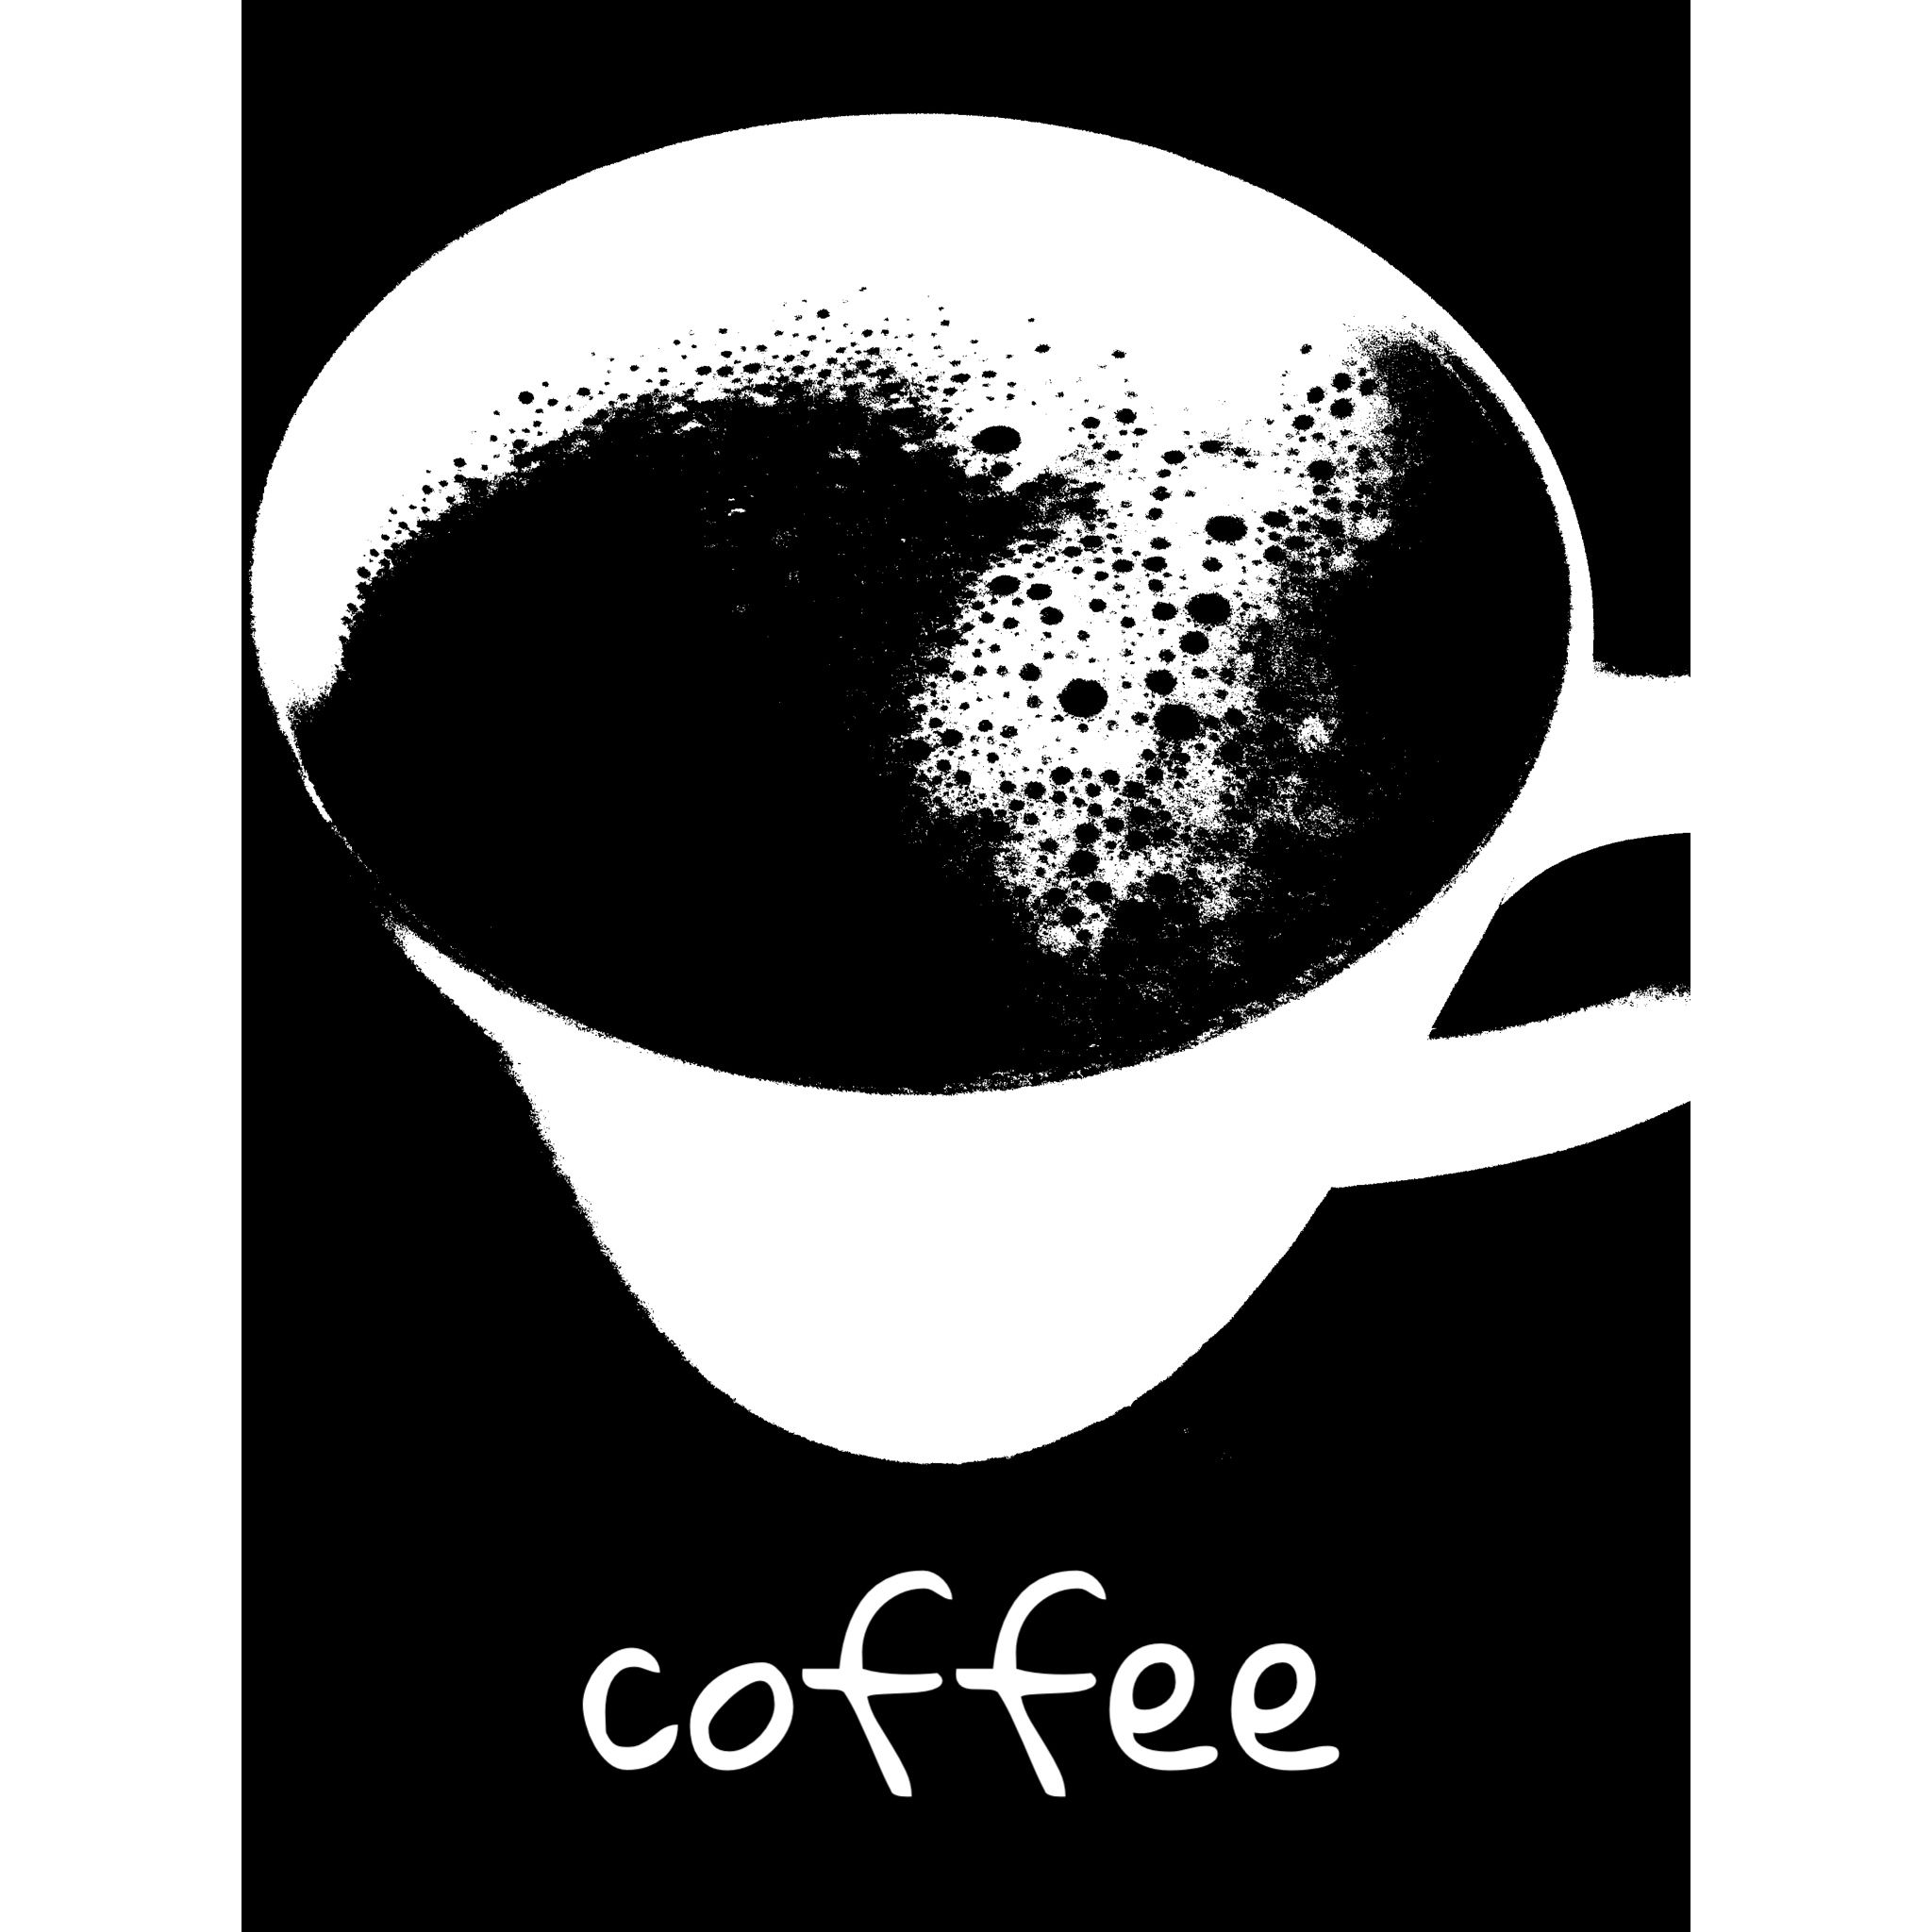 #coffee #coffeeart #javainmycup